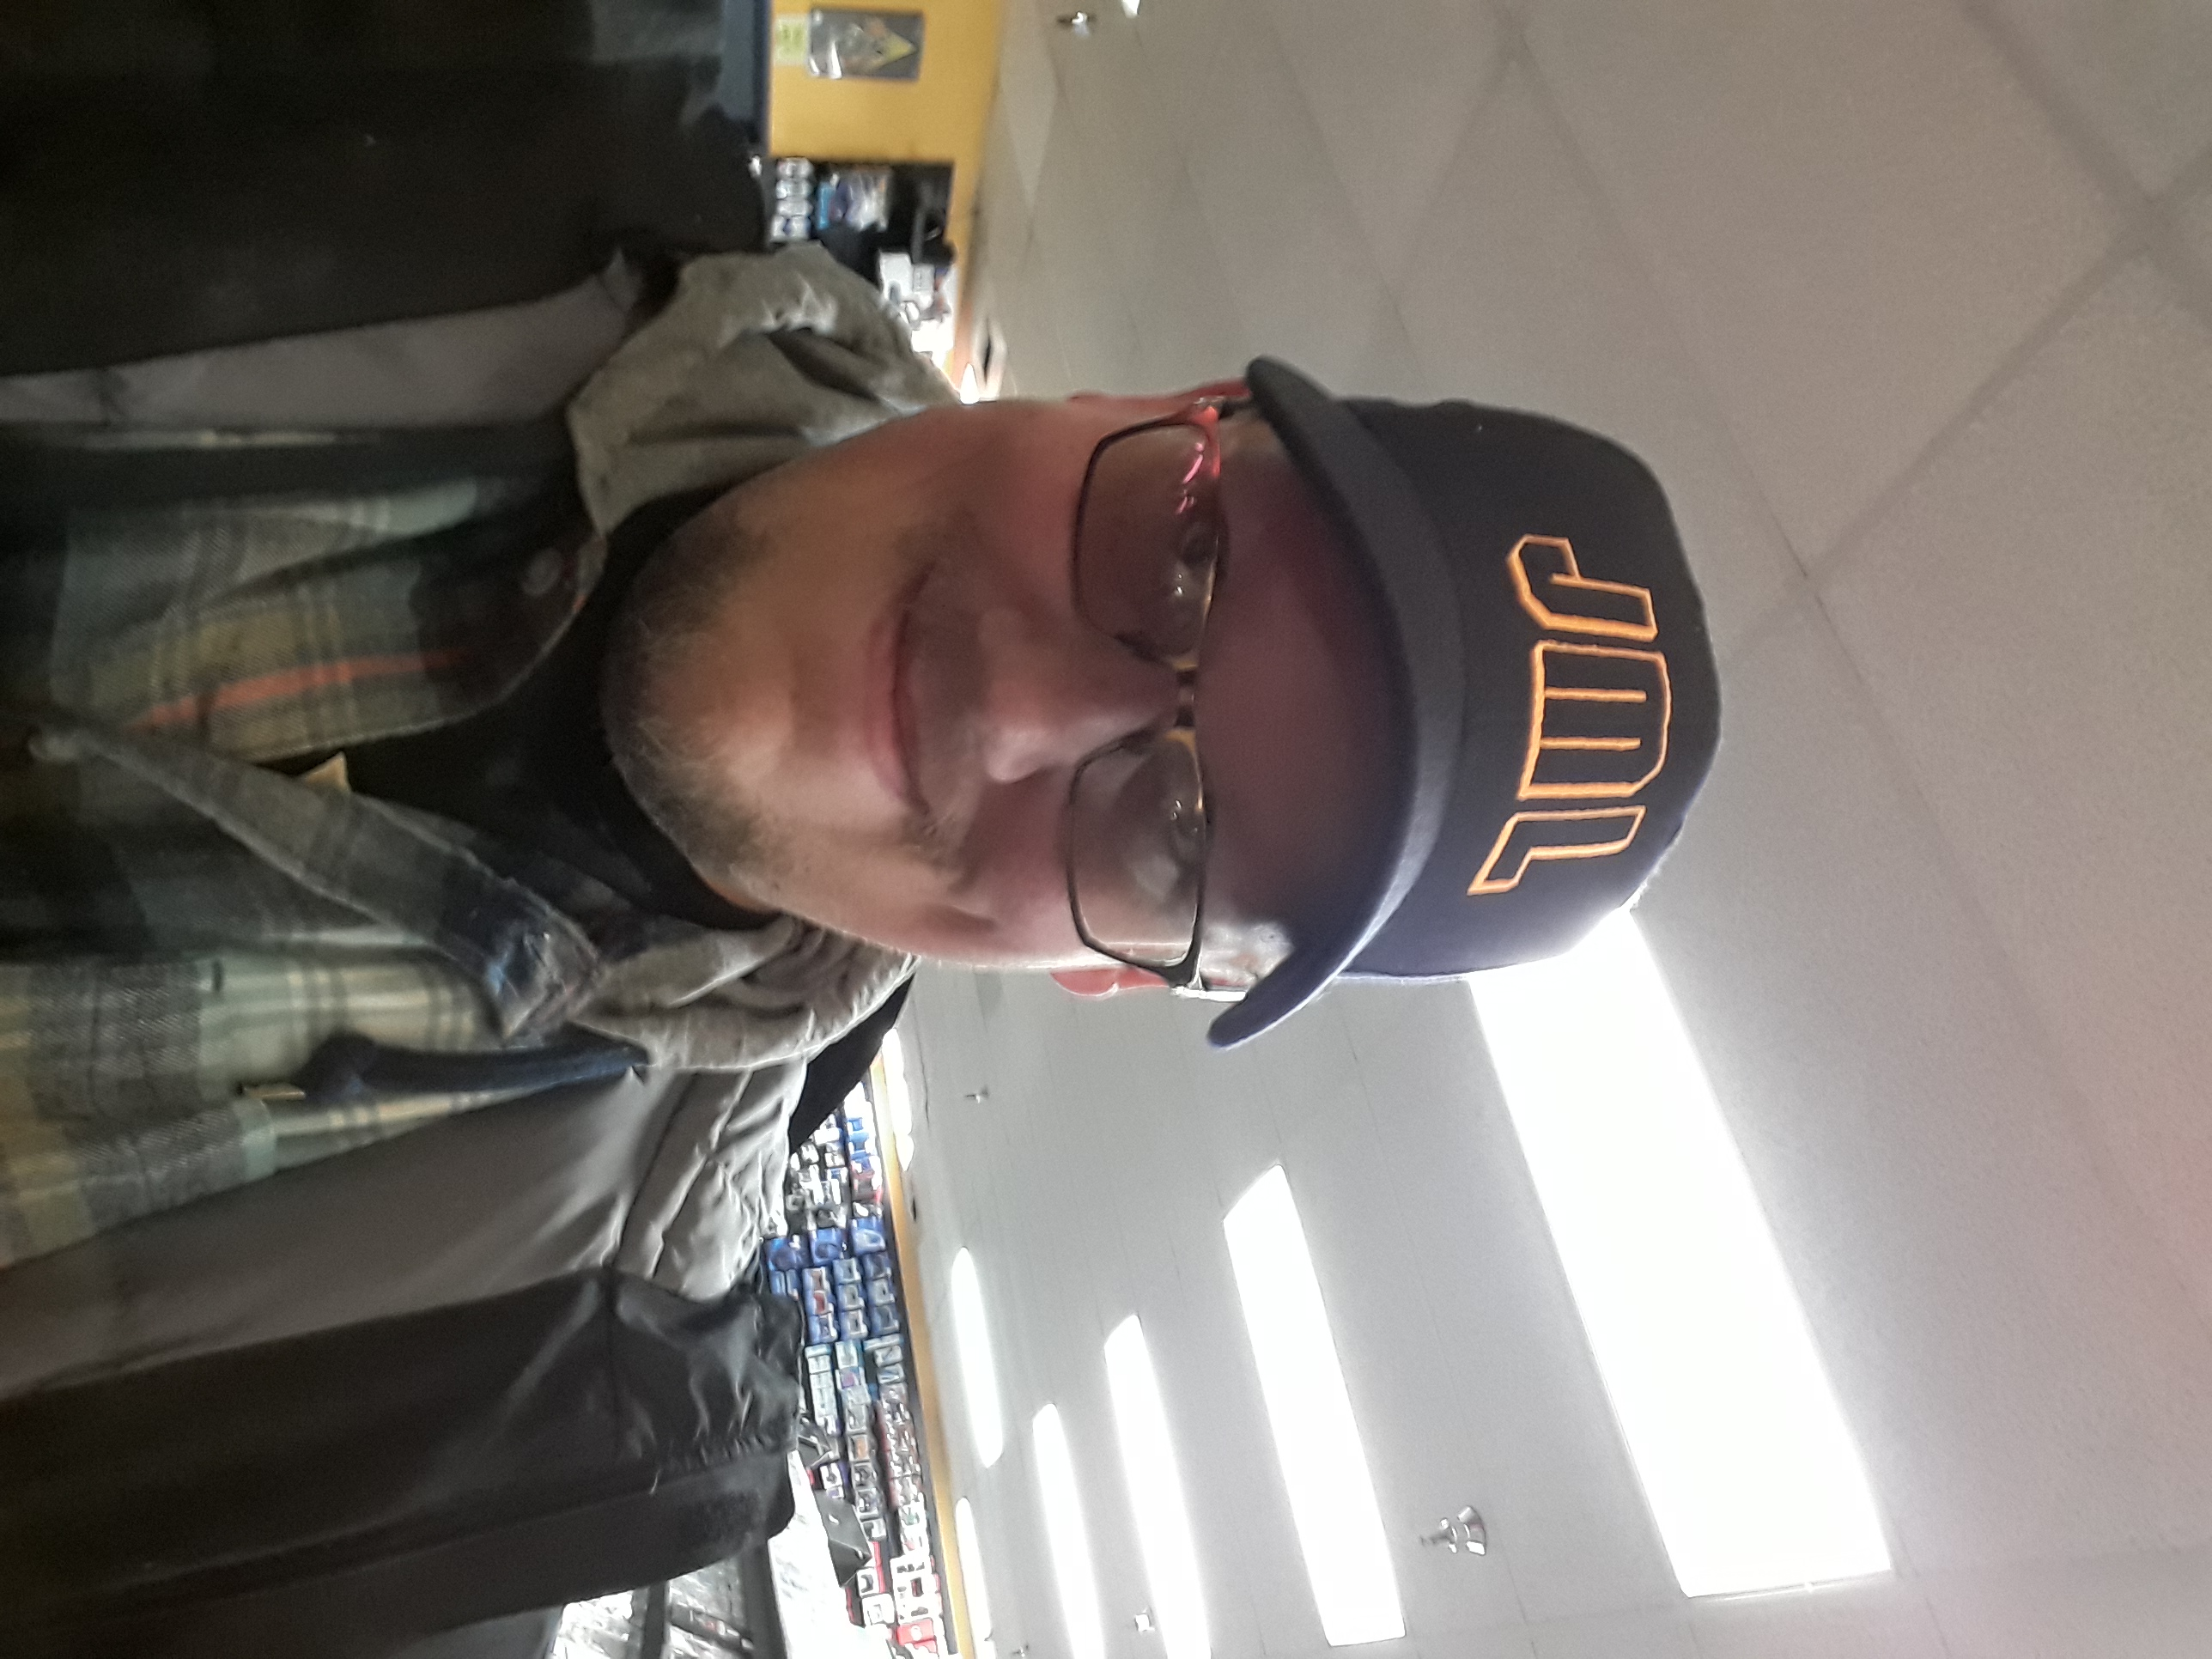 JML101582: X-Men (Arcade) 148 points on 2019-10-15 16:18:53